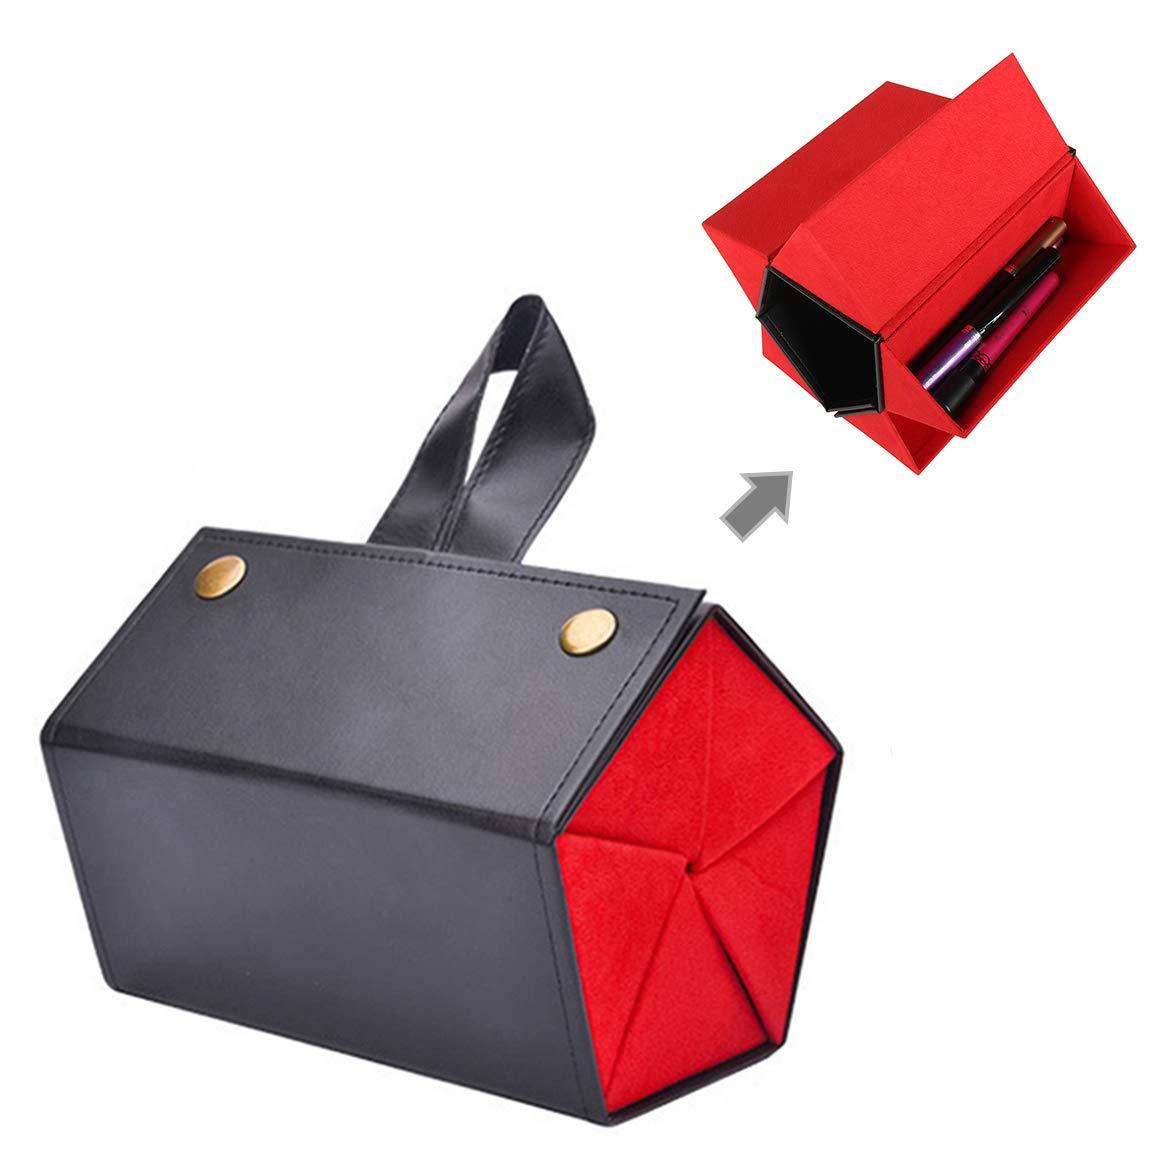 Folding Design PU Eyeglasses Storage Case Box Multiple Hanging Eyewear Holder Display 5-Slot Travel Sunglasses Organizer